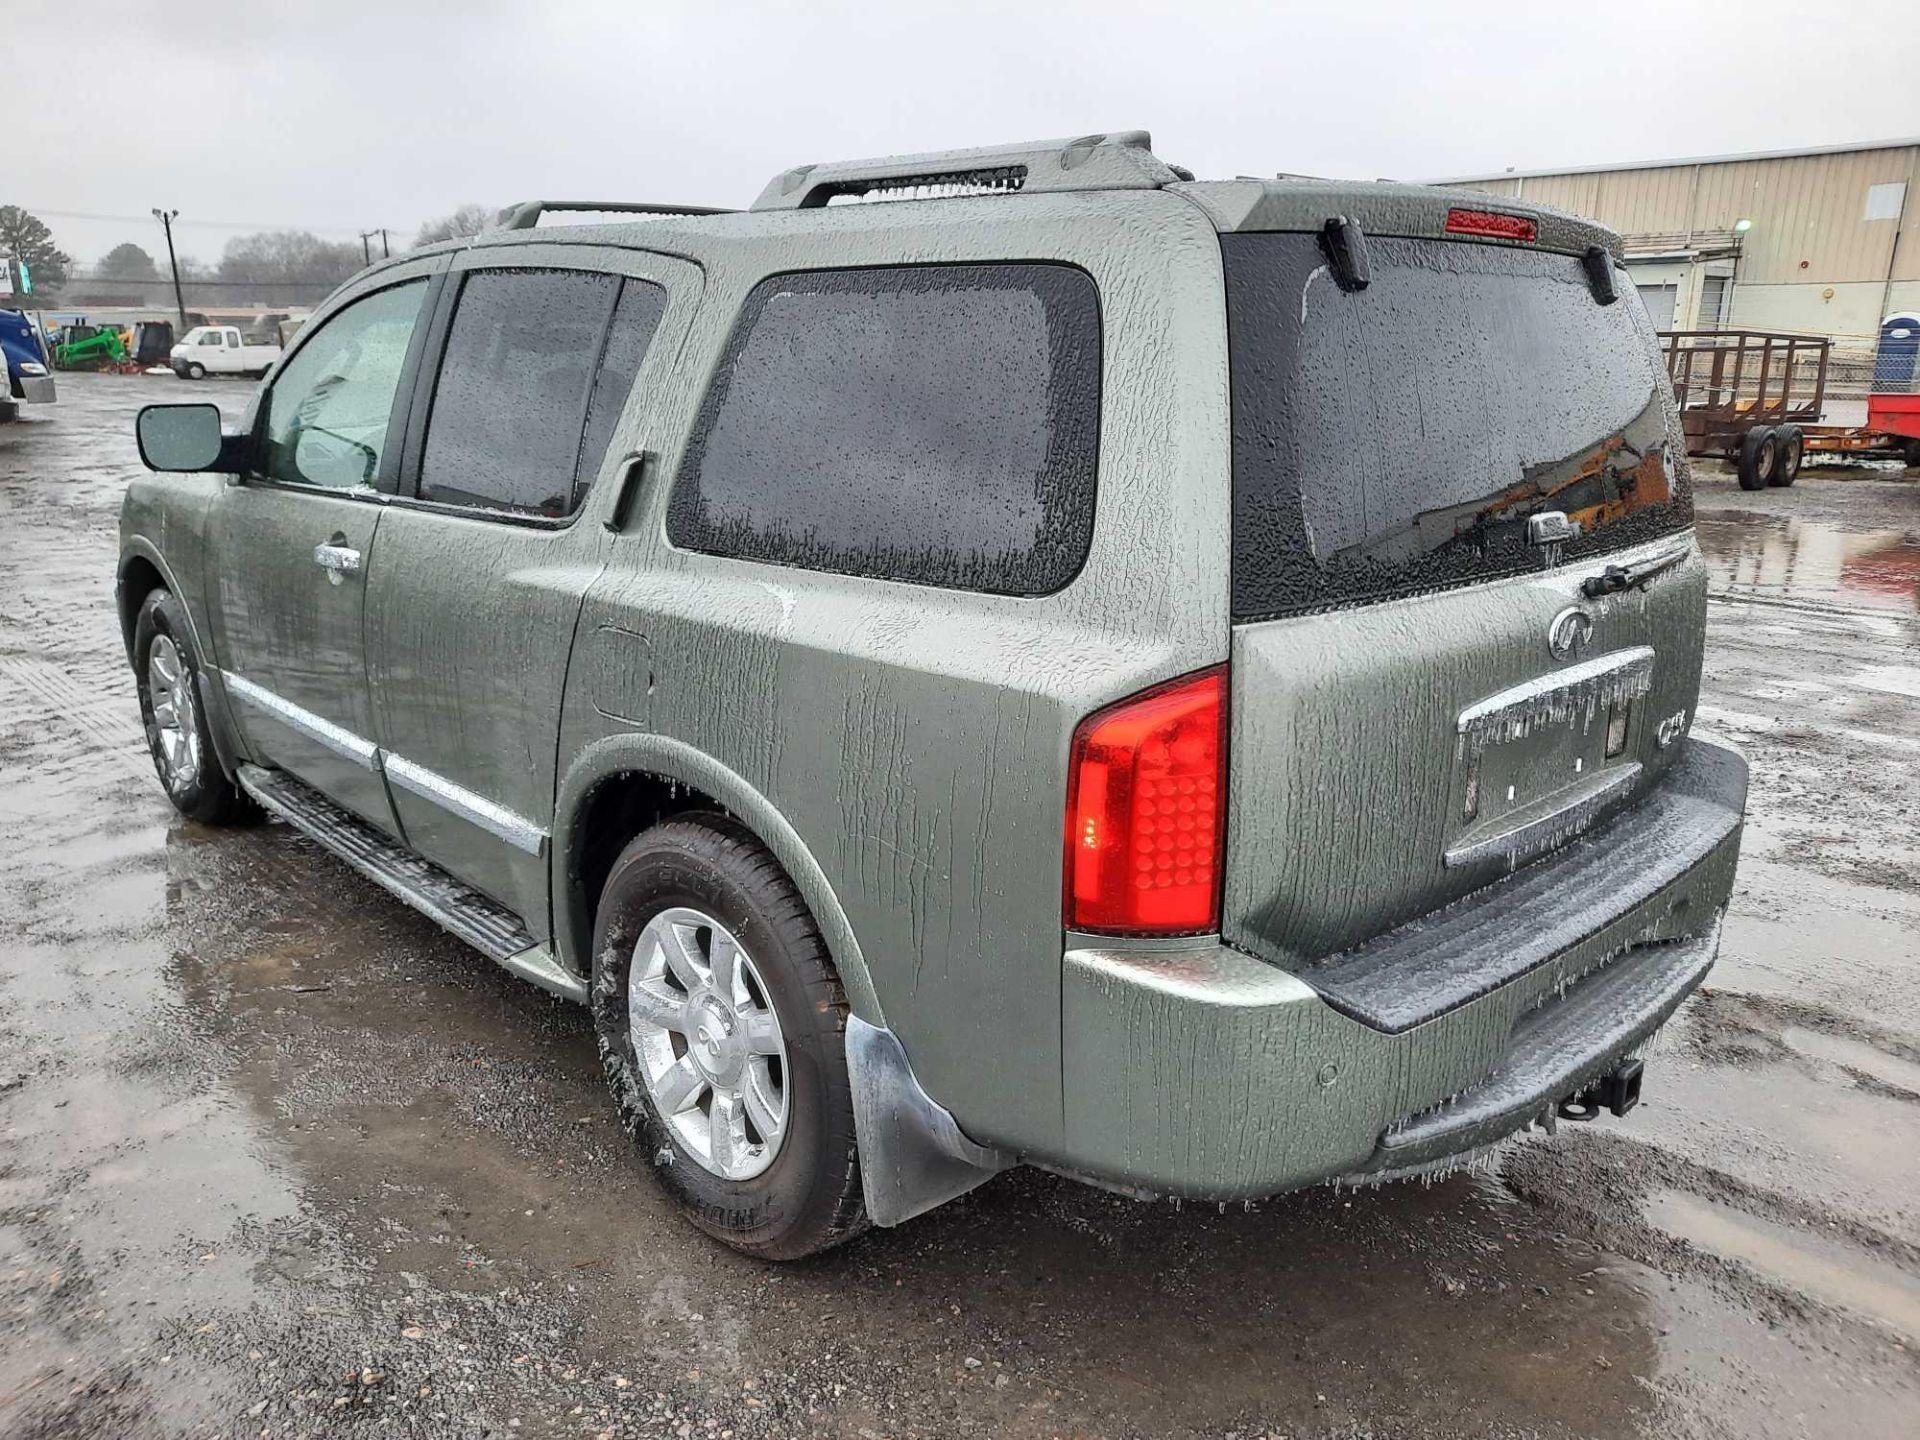 2004 INFINITI QX56 4X4 SUV - Image 2 of 4